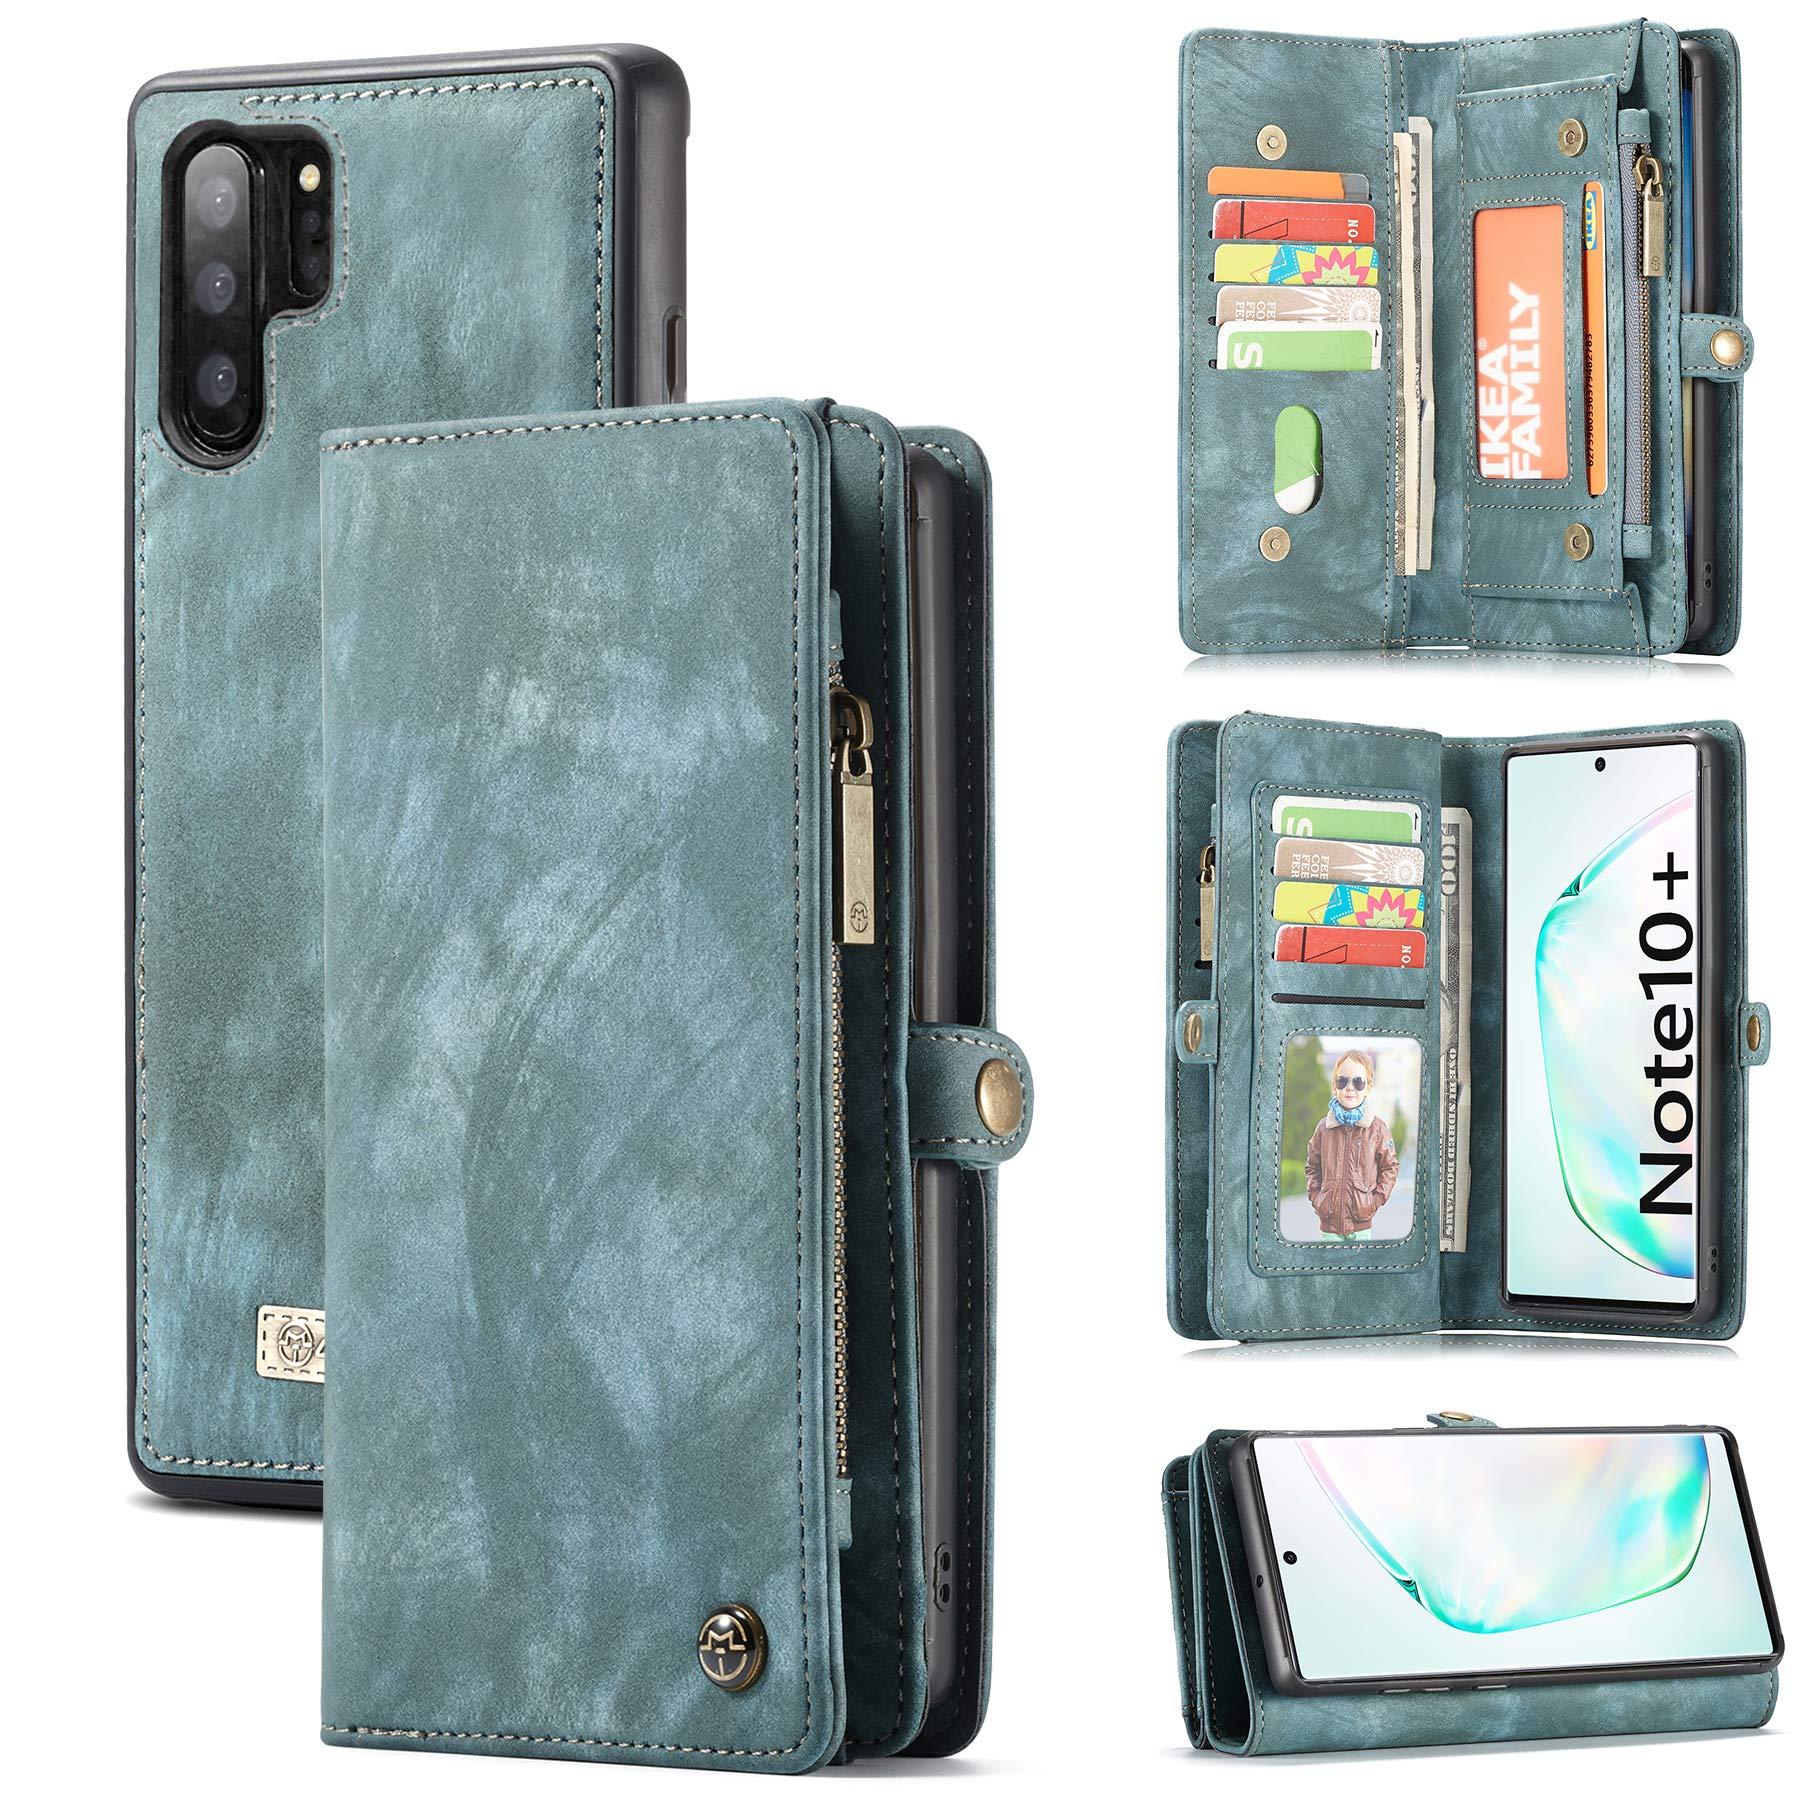 Galaxy Note 10/10+ Plus Wallet Case, Zttopo 2 in 1 Premium Leather Zipper Detachable Magnetic 11 Card Slots Folding Flip Money Pocket Clutch for Note 10/10plus (Blue-Green, Galaxy Note 10 Plus) by Zttopo